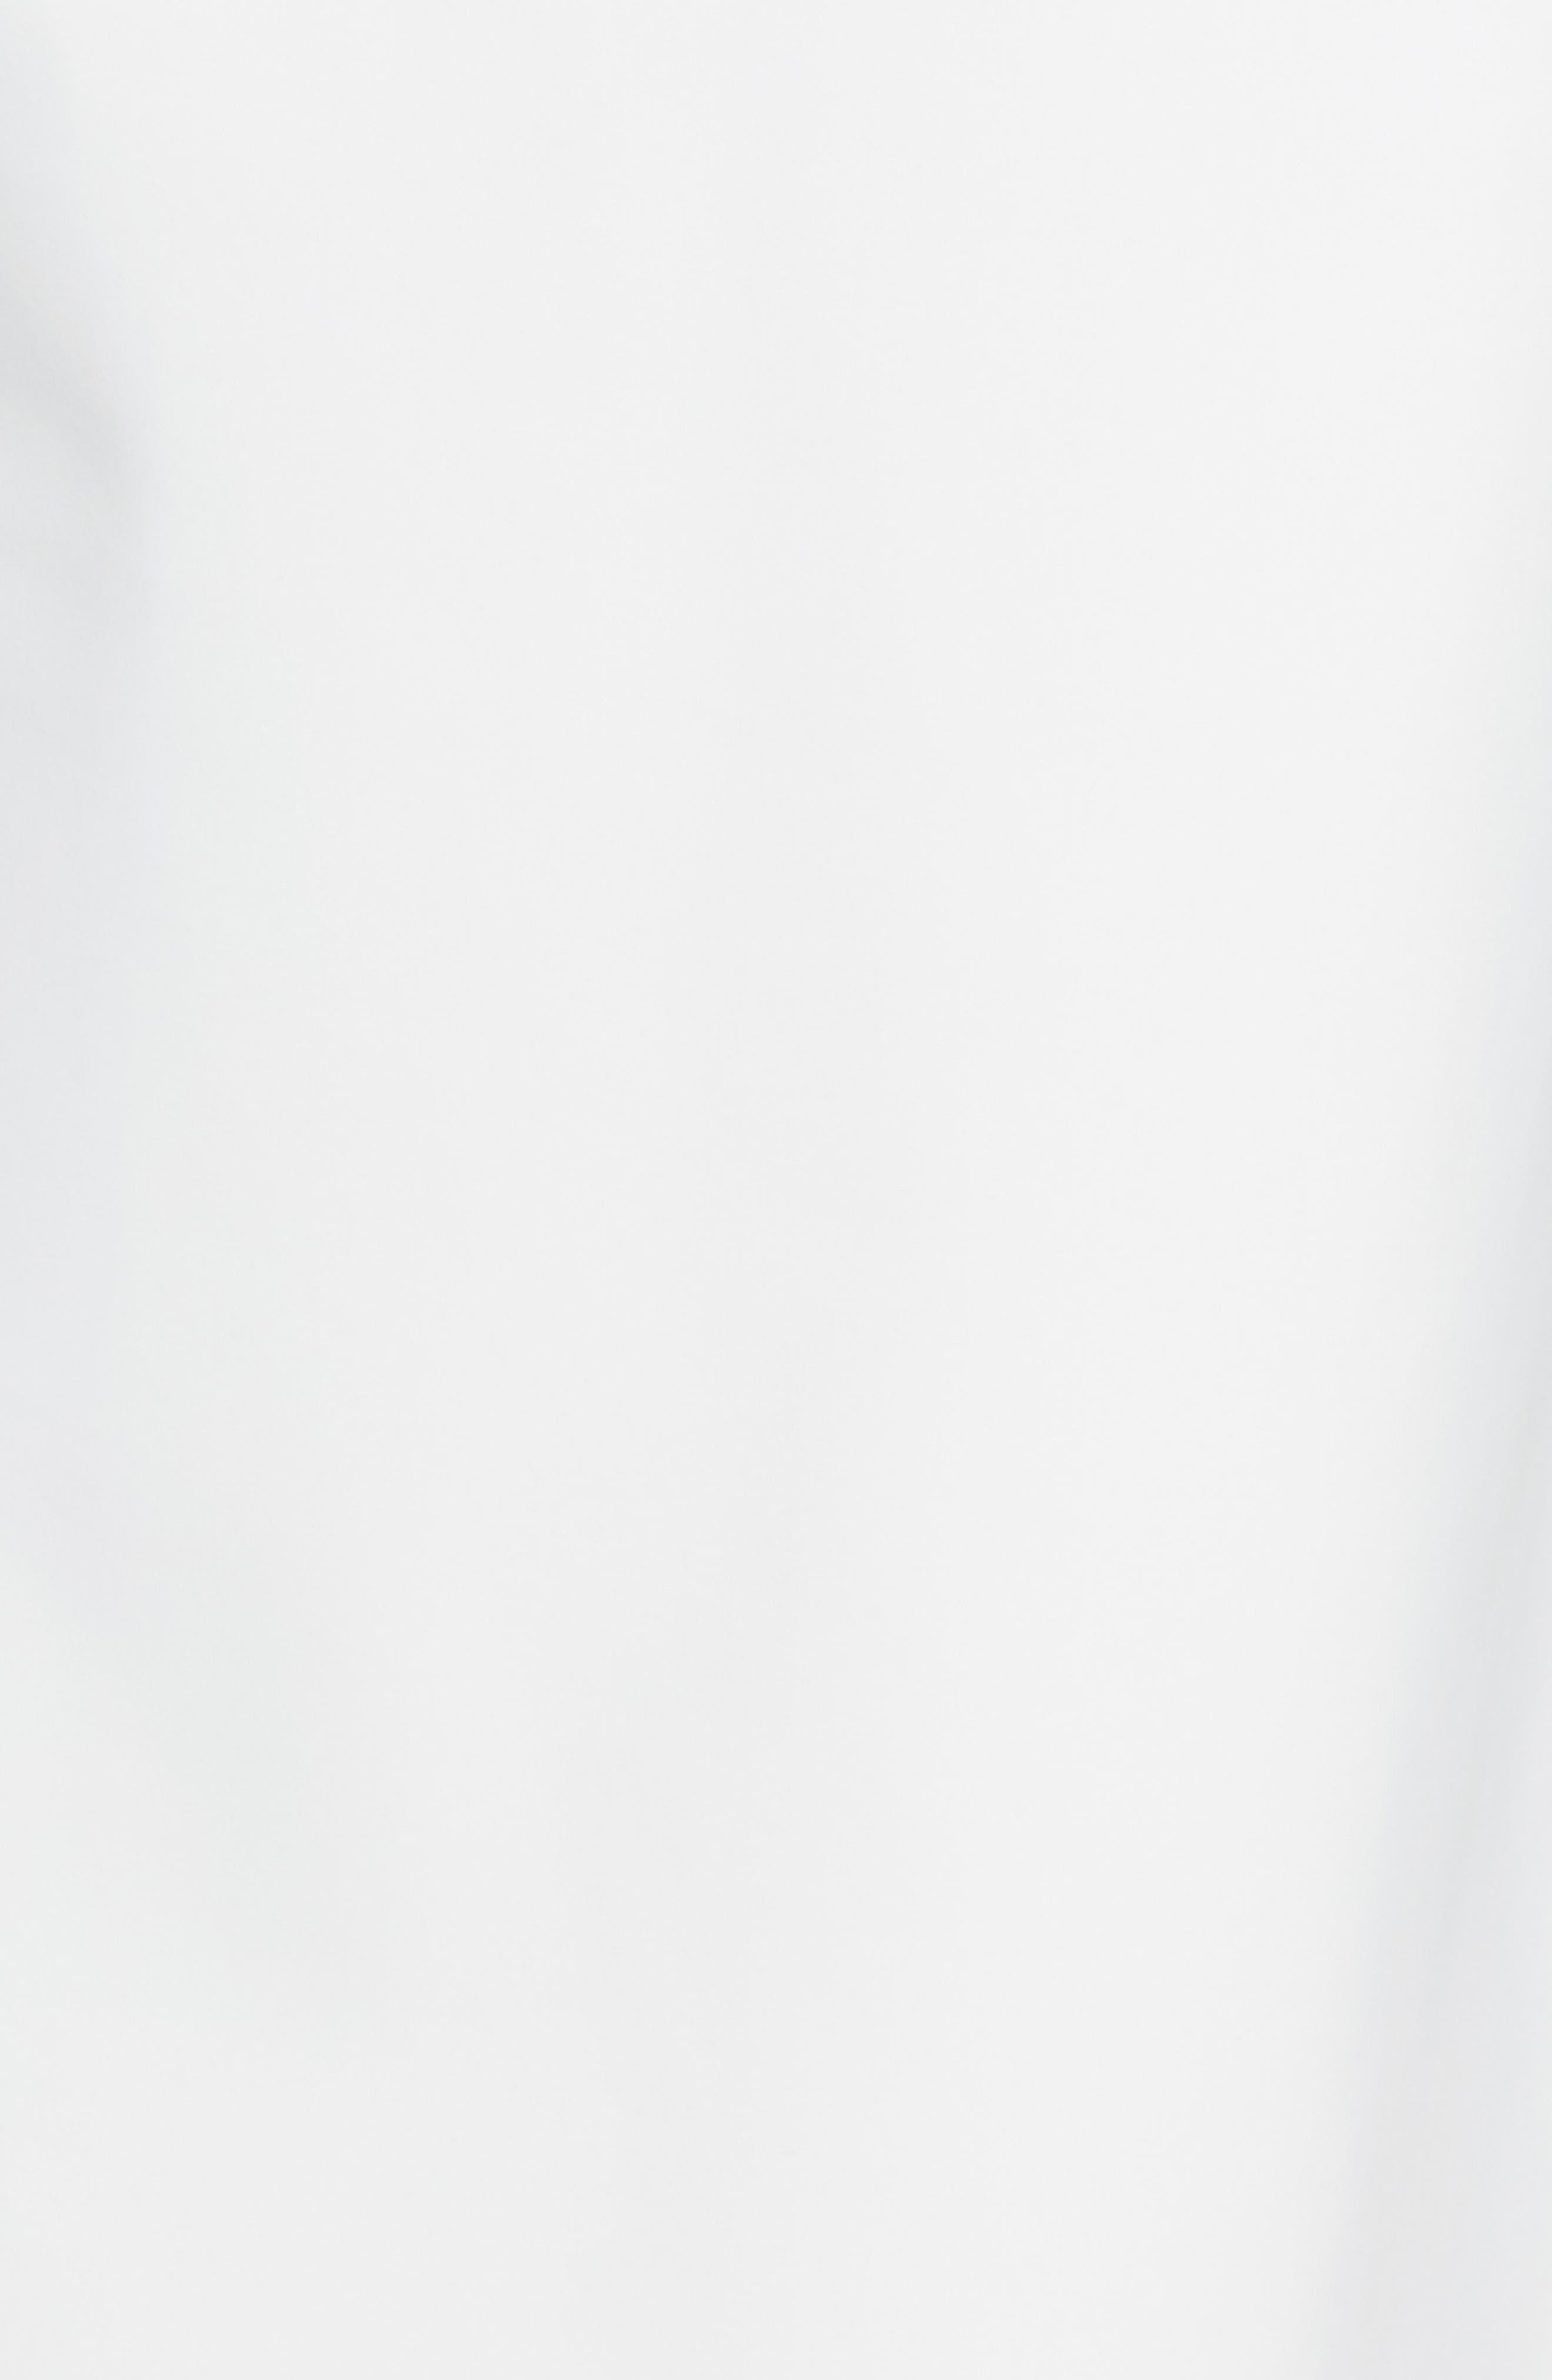 Keke Ruffle Front Surplice Gown,                             Alternate thumbnail 5, color,                             White